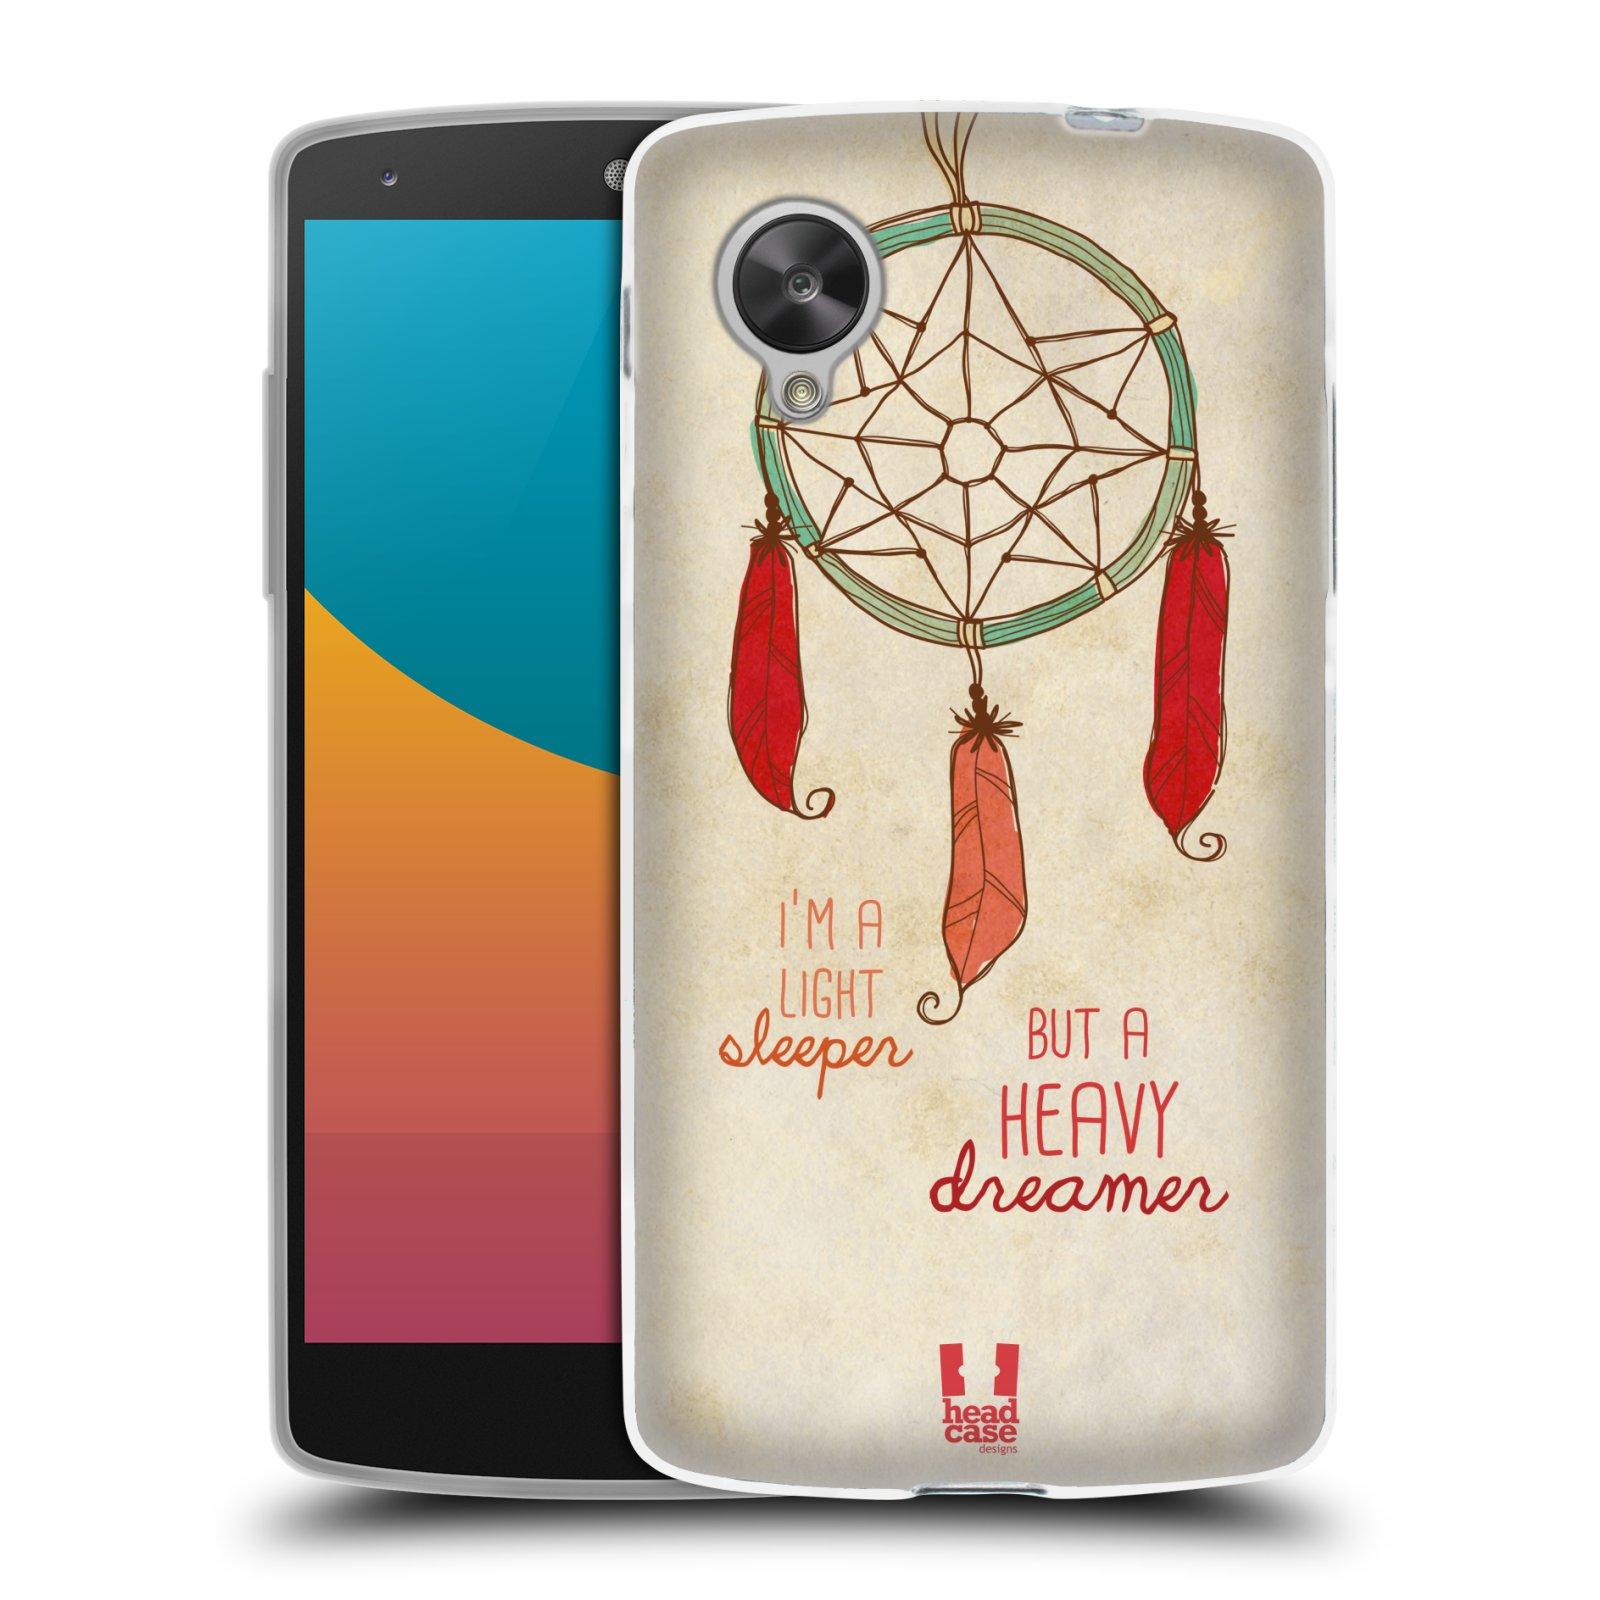 Silikonové pouzdro na mobil LG Nexus 5 HEAD CASE LAPAČ HEAVY DREAMER (Silikonový kryt či obal na mobilní telefon LG Google Nexus 5 D821)